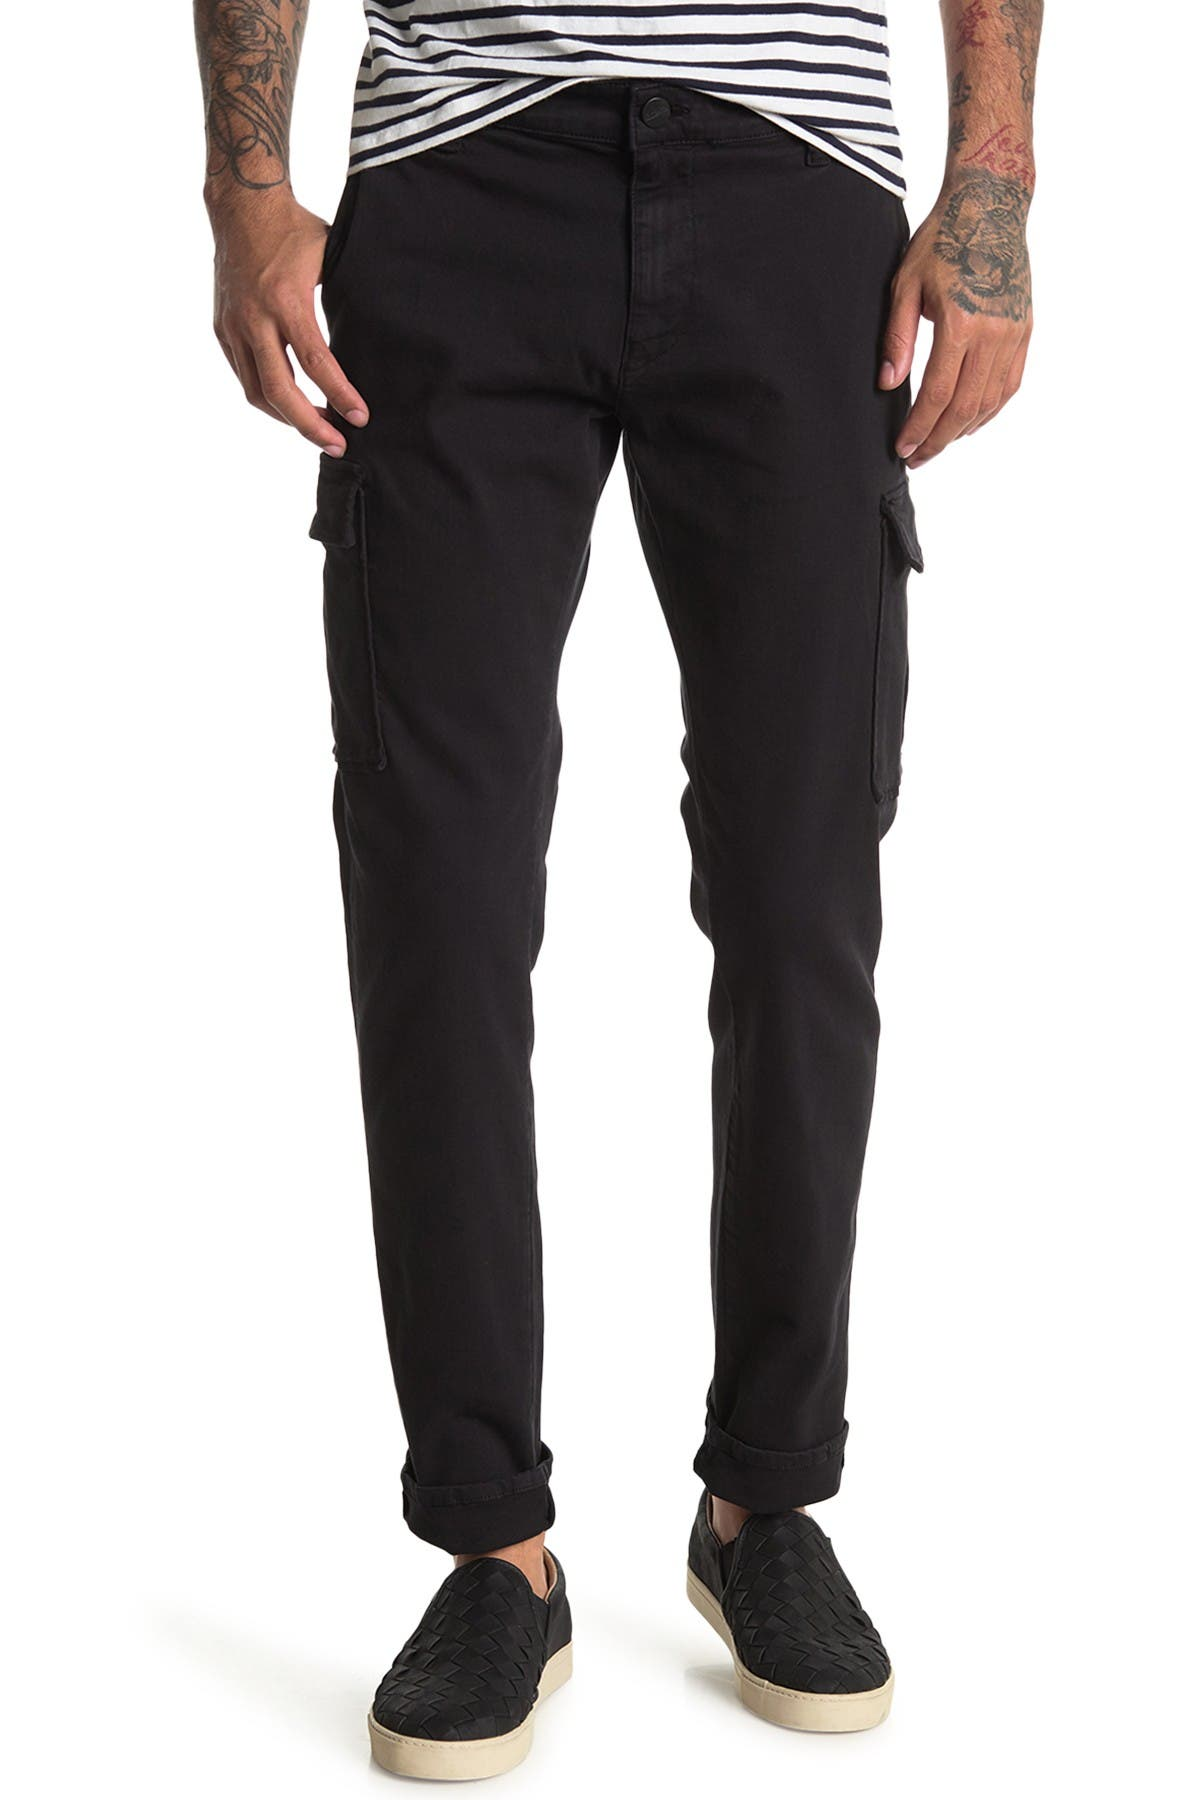 Image of 34 Heritage 34 Carson Black Twill Cargo Pants